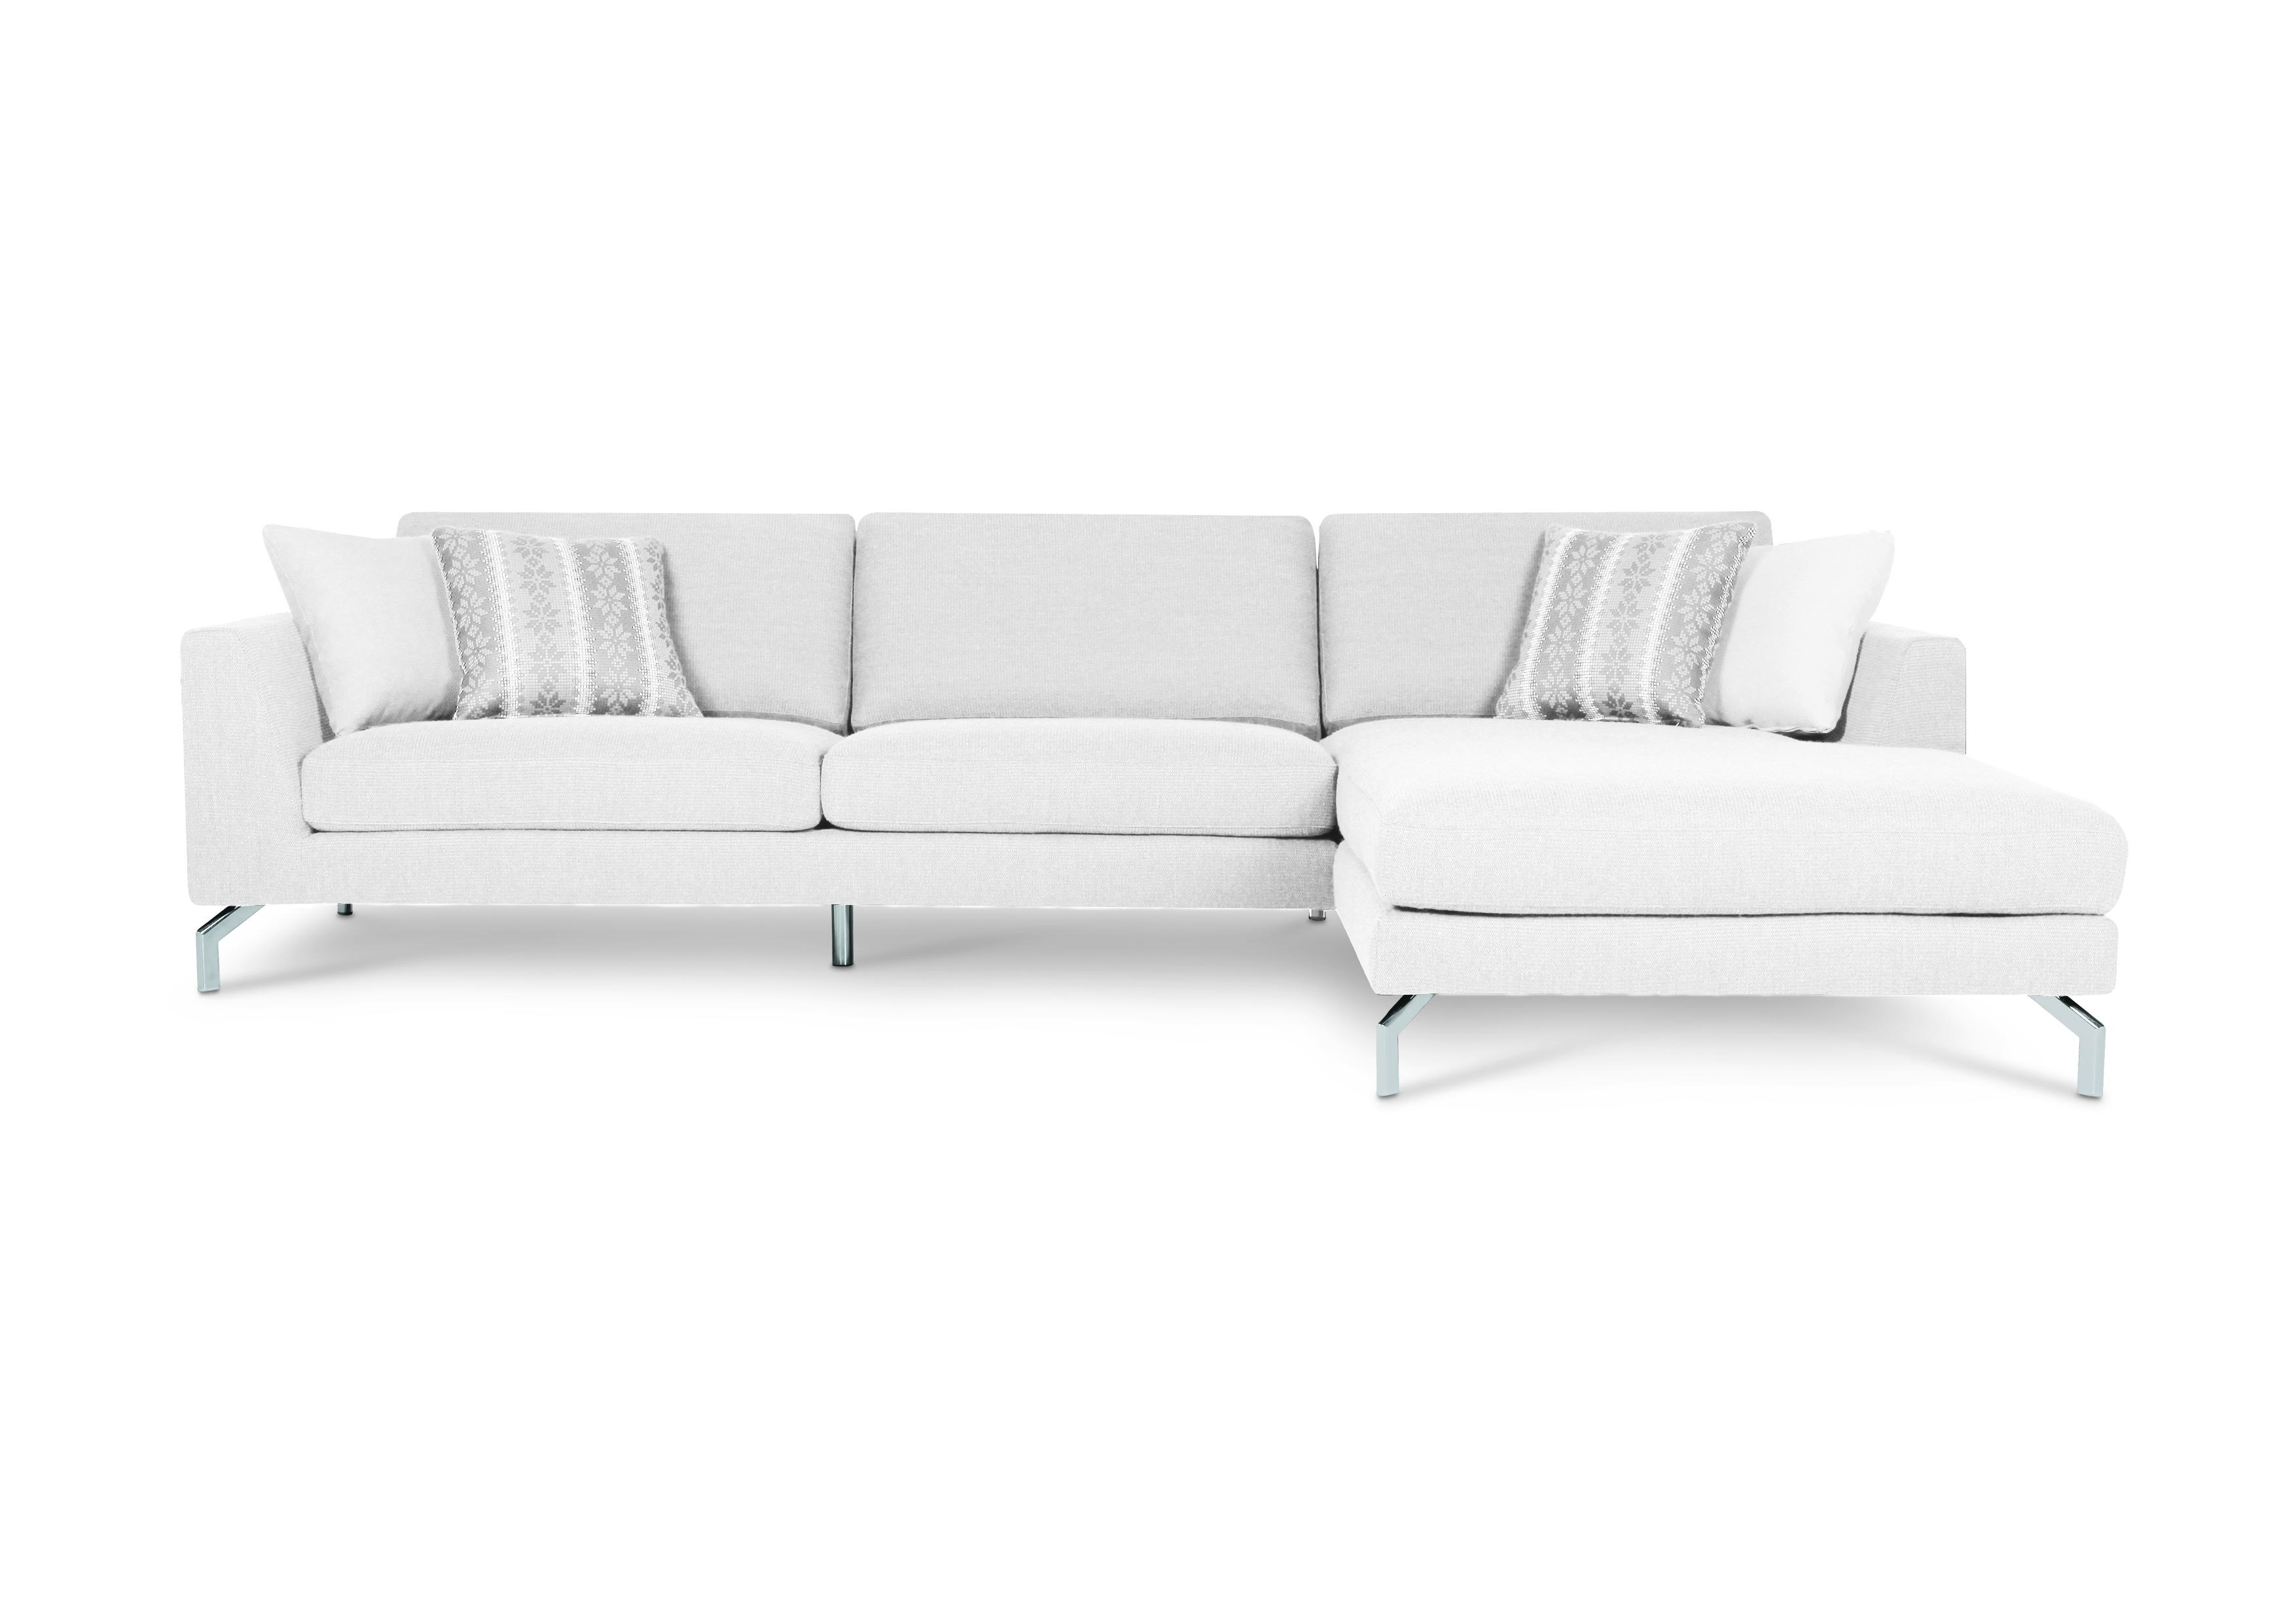 Allegra Set 1 Sofa With Chaiselongue-0